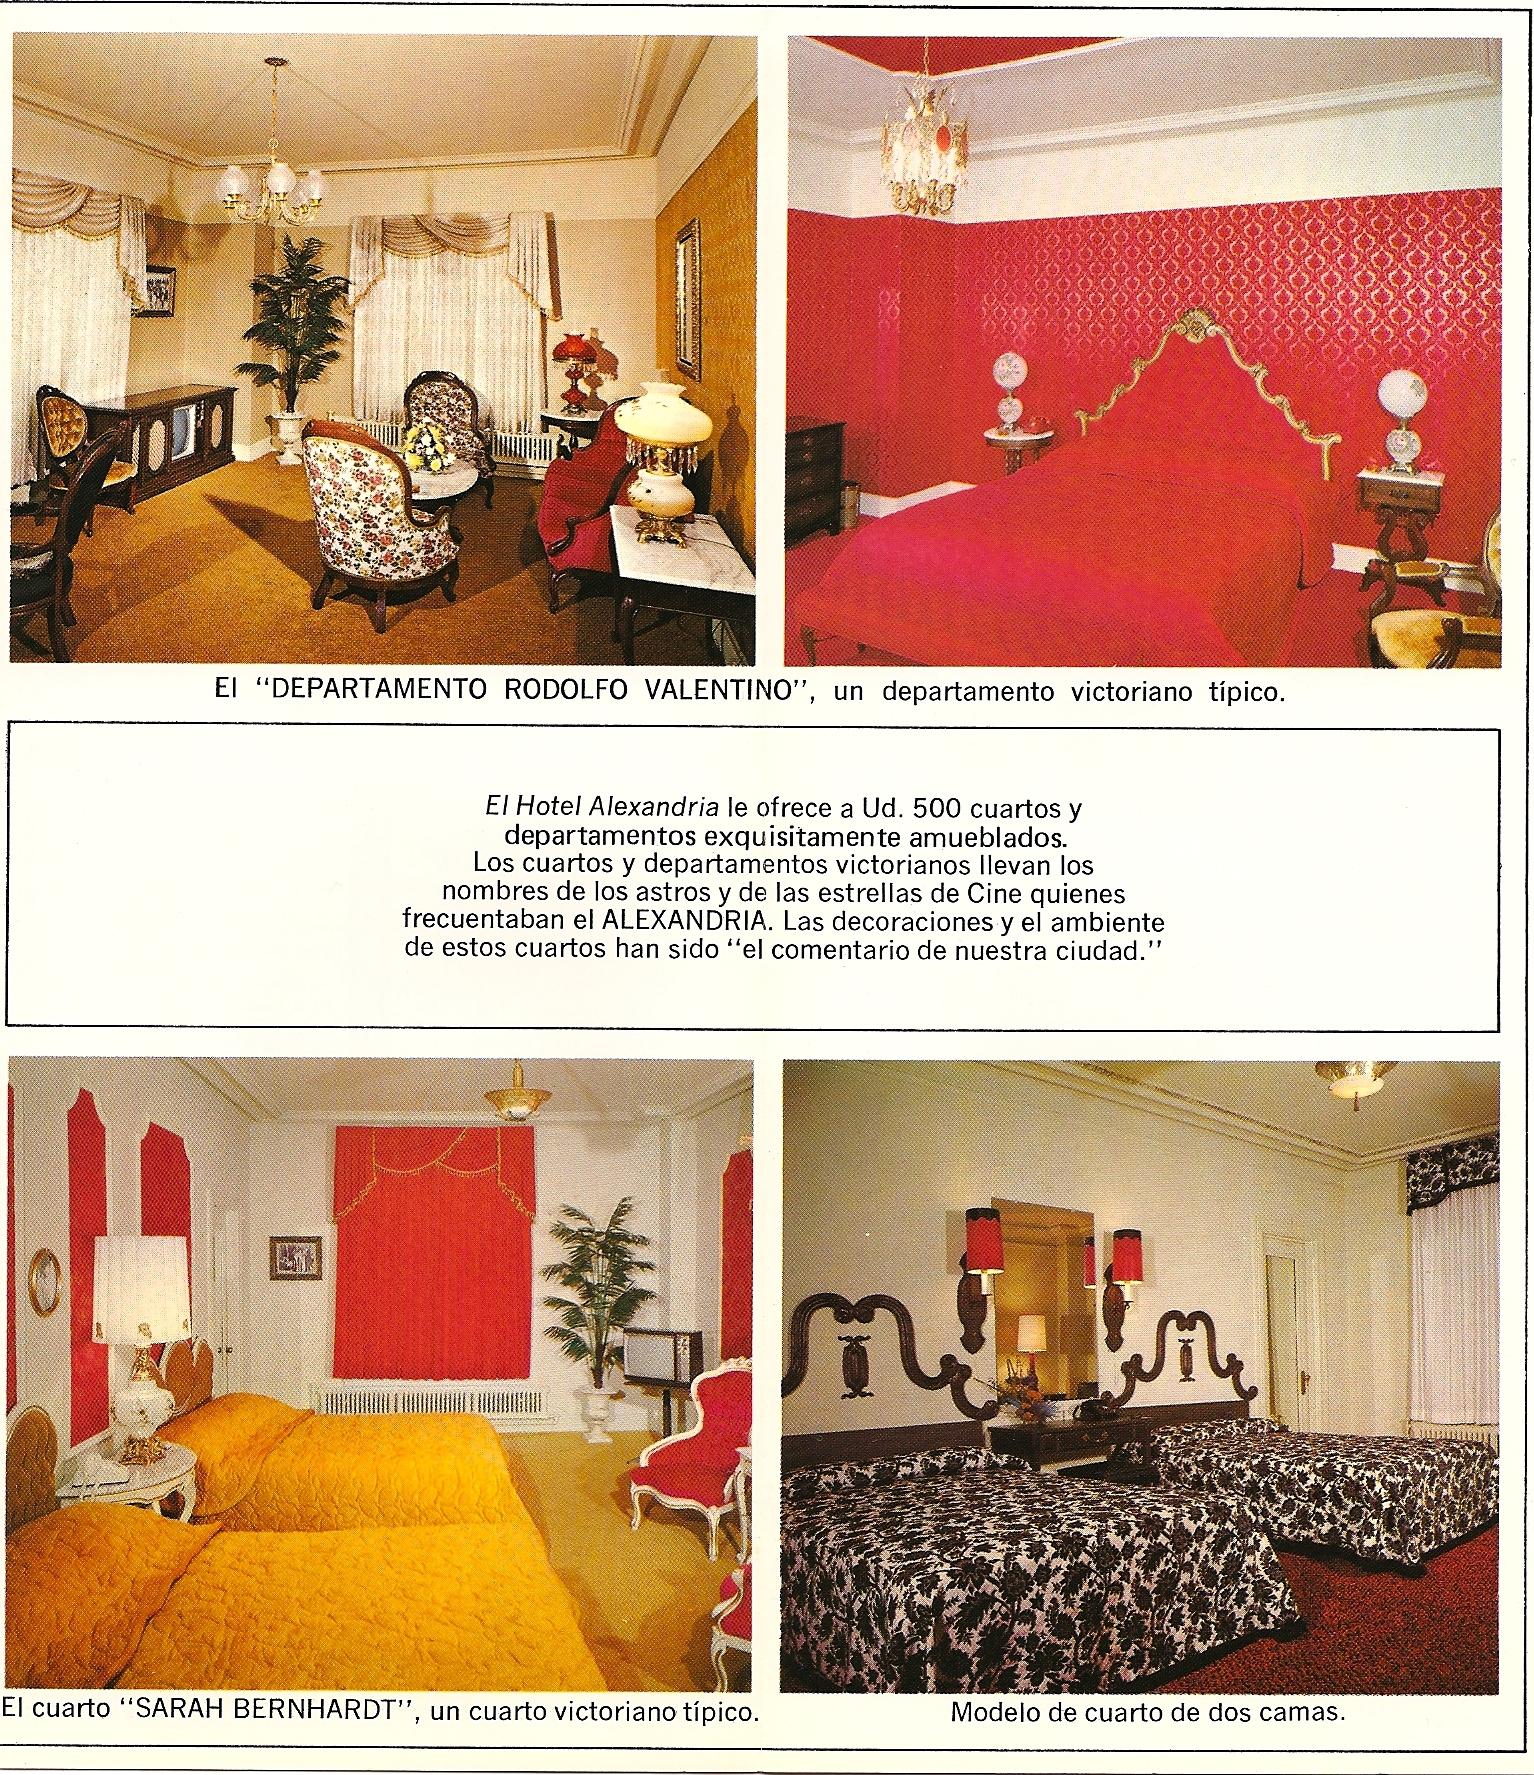 Hotel brochure design sample 101greatbrochures of for Hotel brochure design